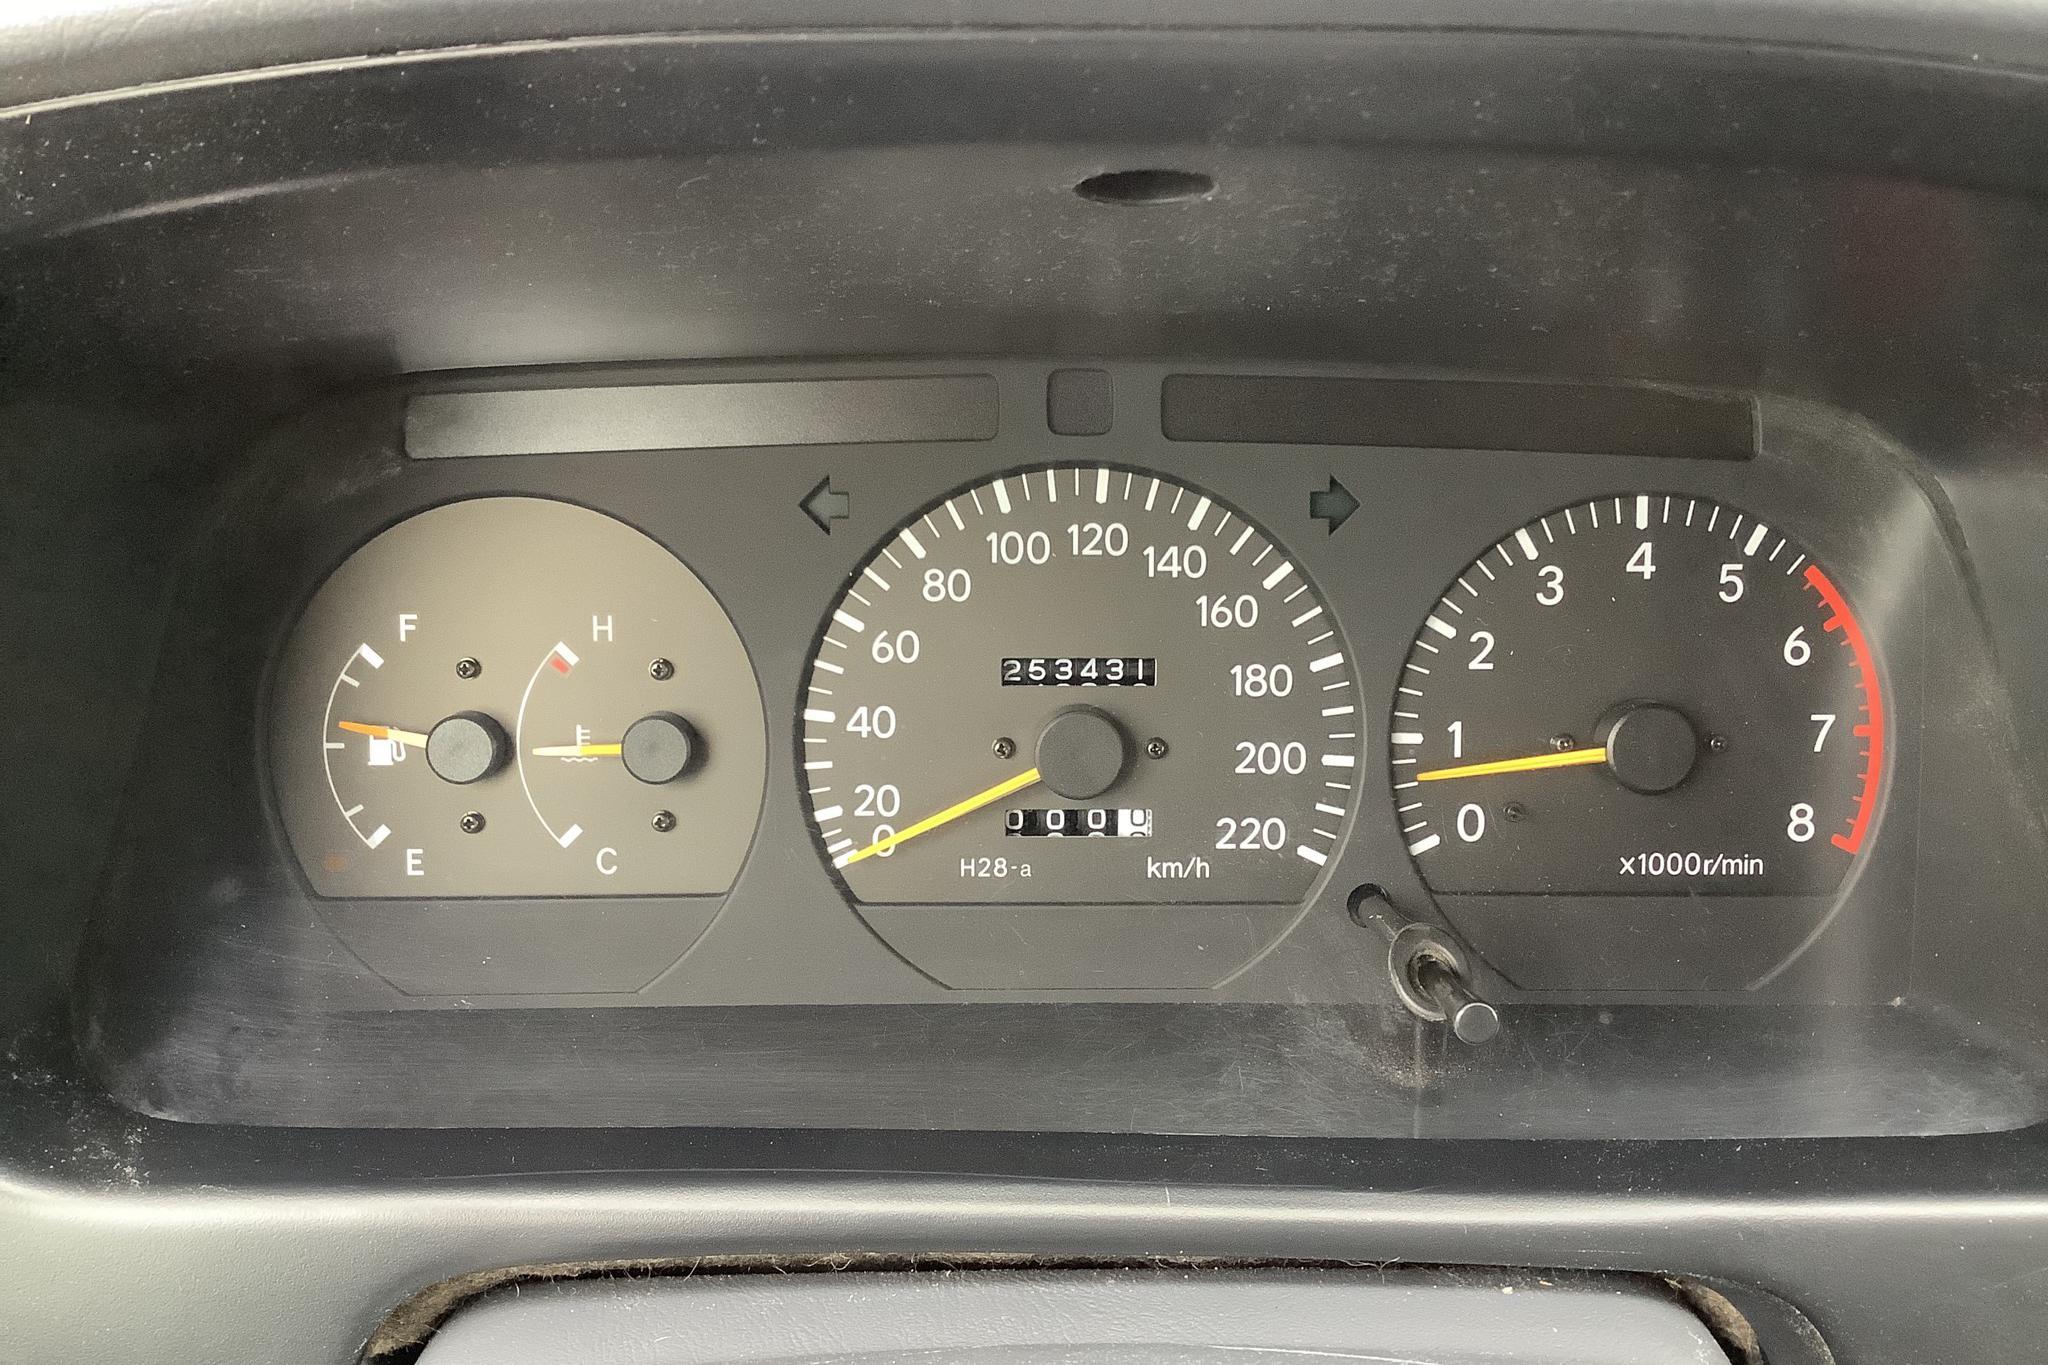 Toyota Hiace 2.7 (143hk) - 253 440 km - Manual - white - 1999